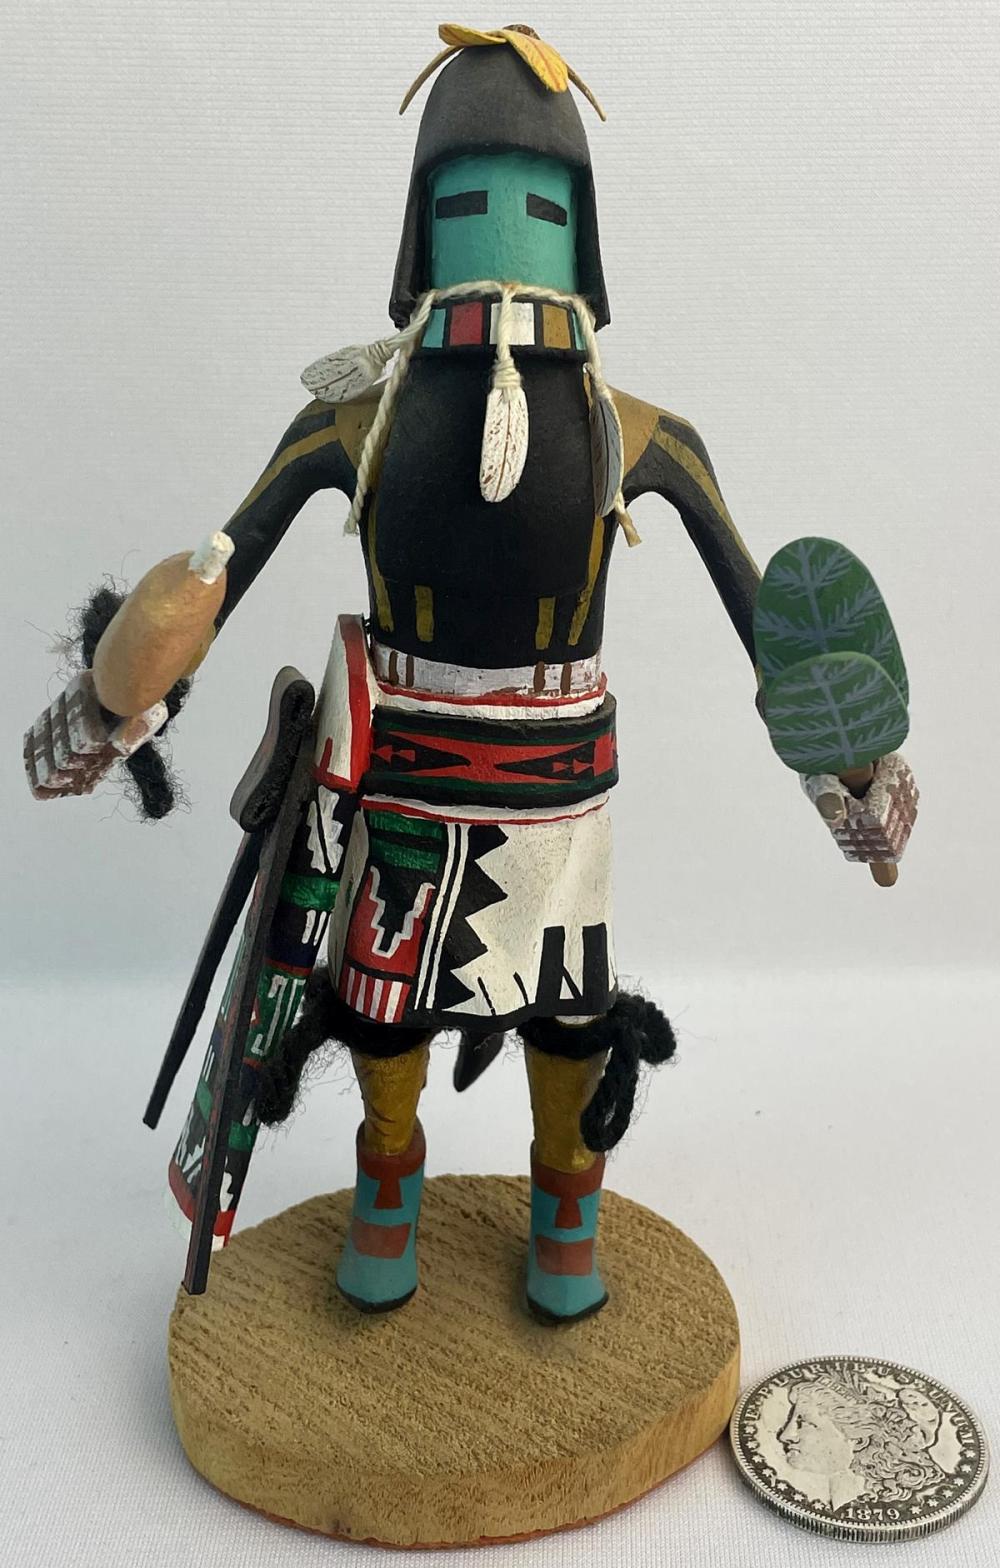 Vintage Native American Hopi Kachina Carved Wood Figurine